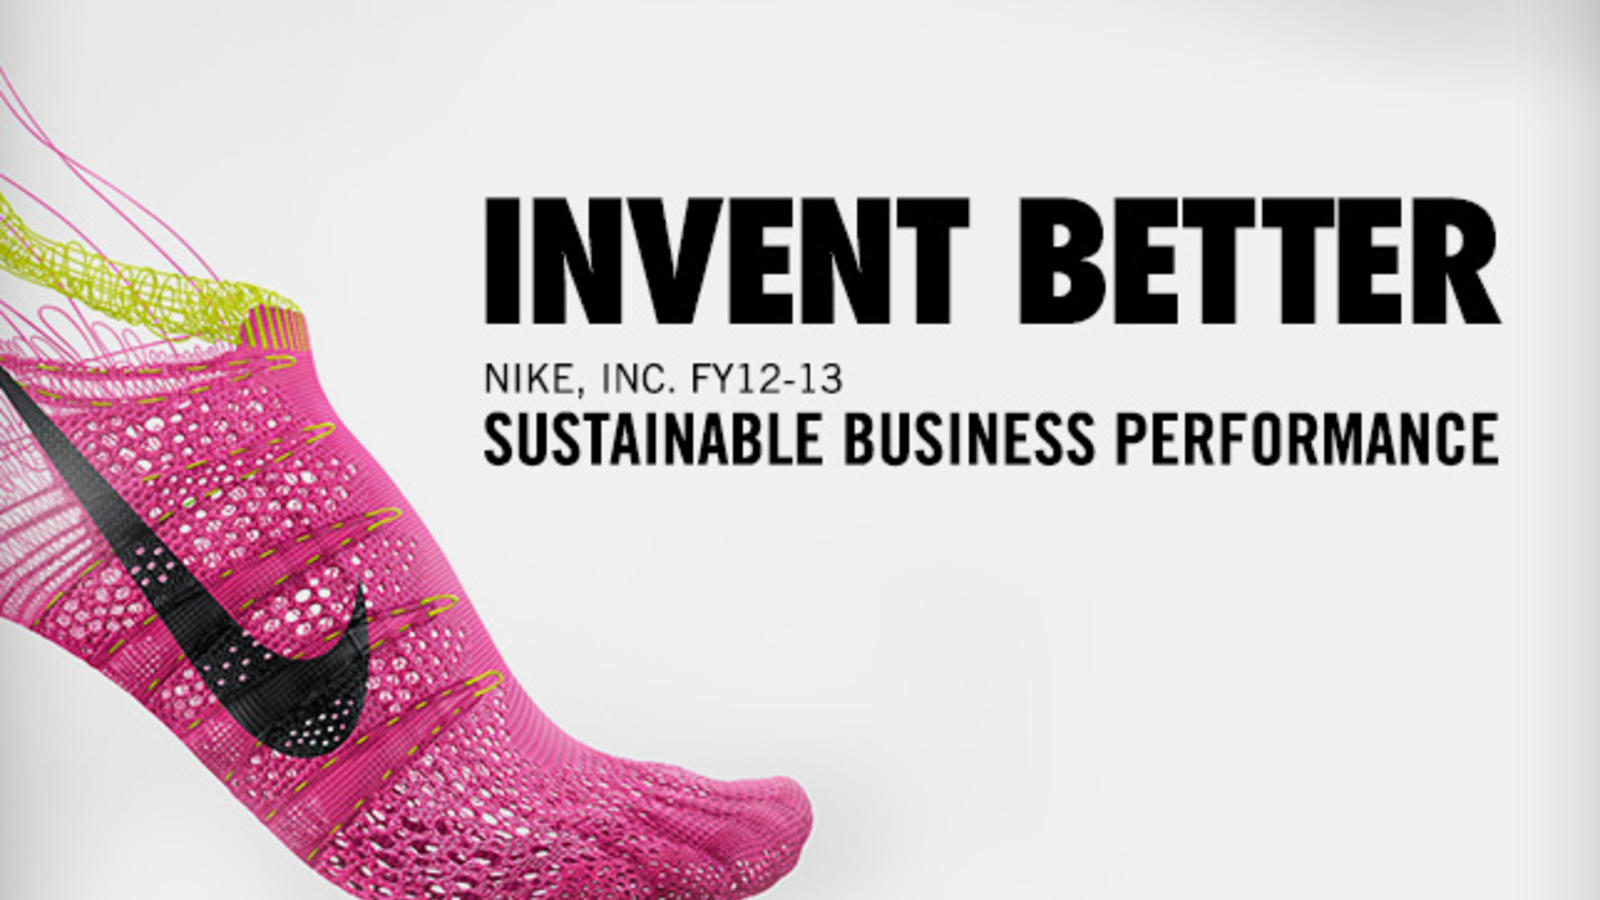 Company Reducing Environmental Impact